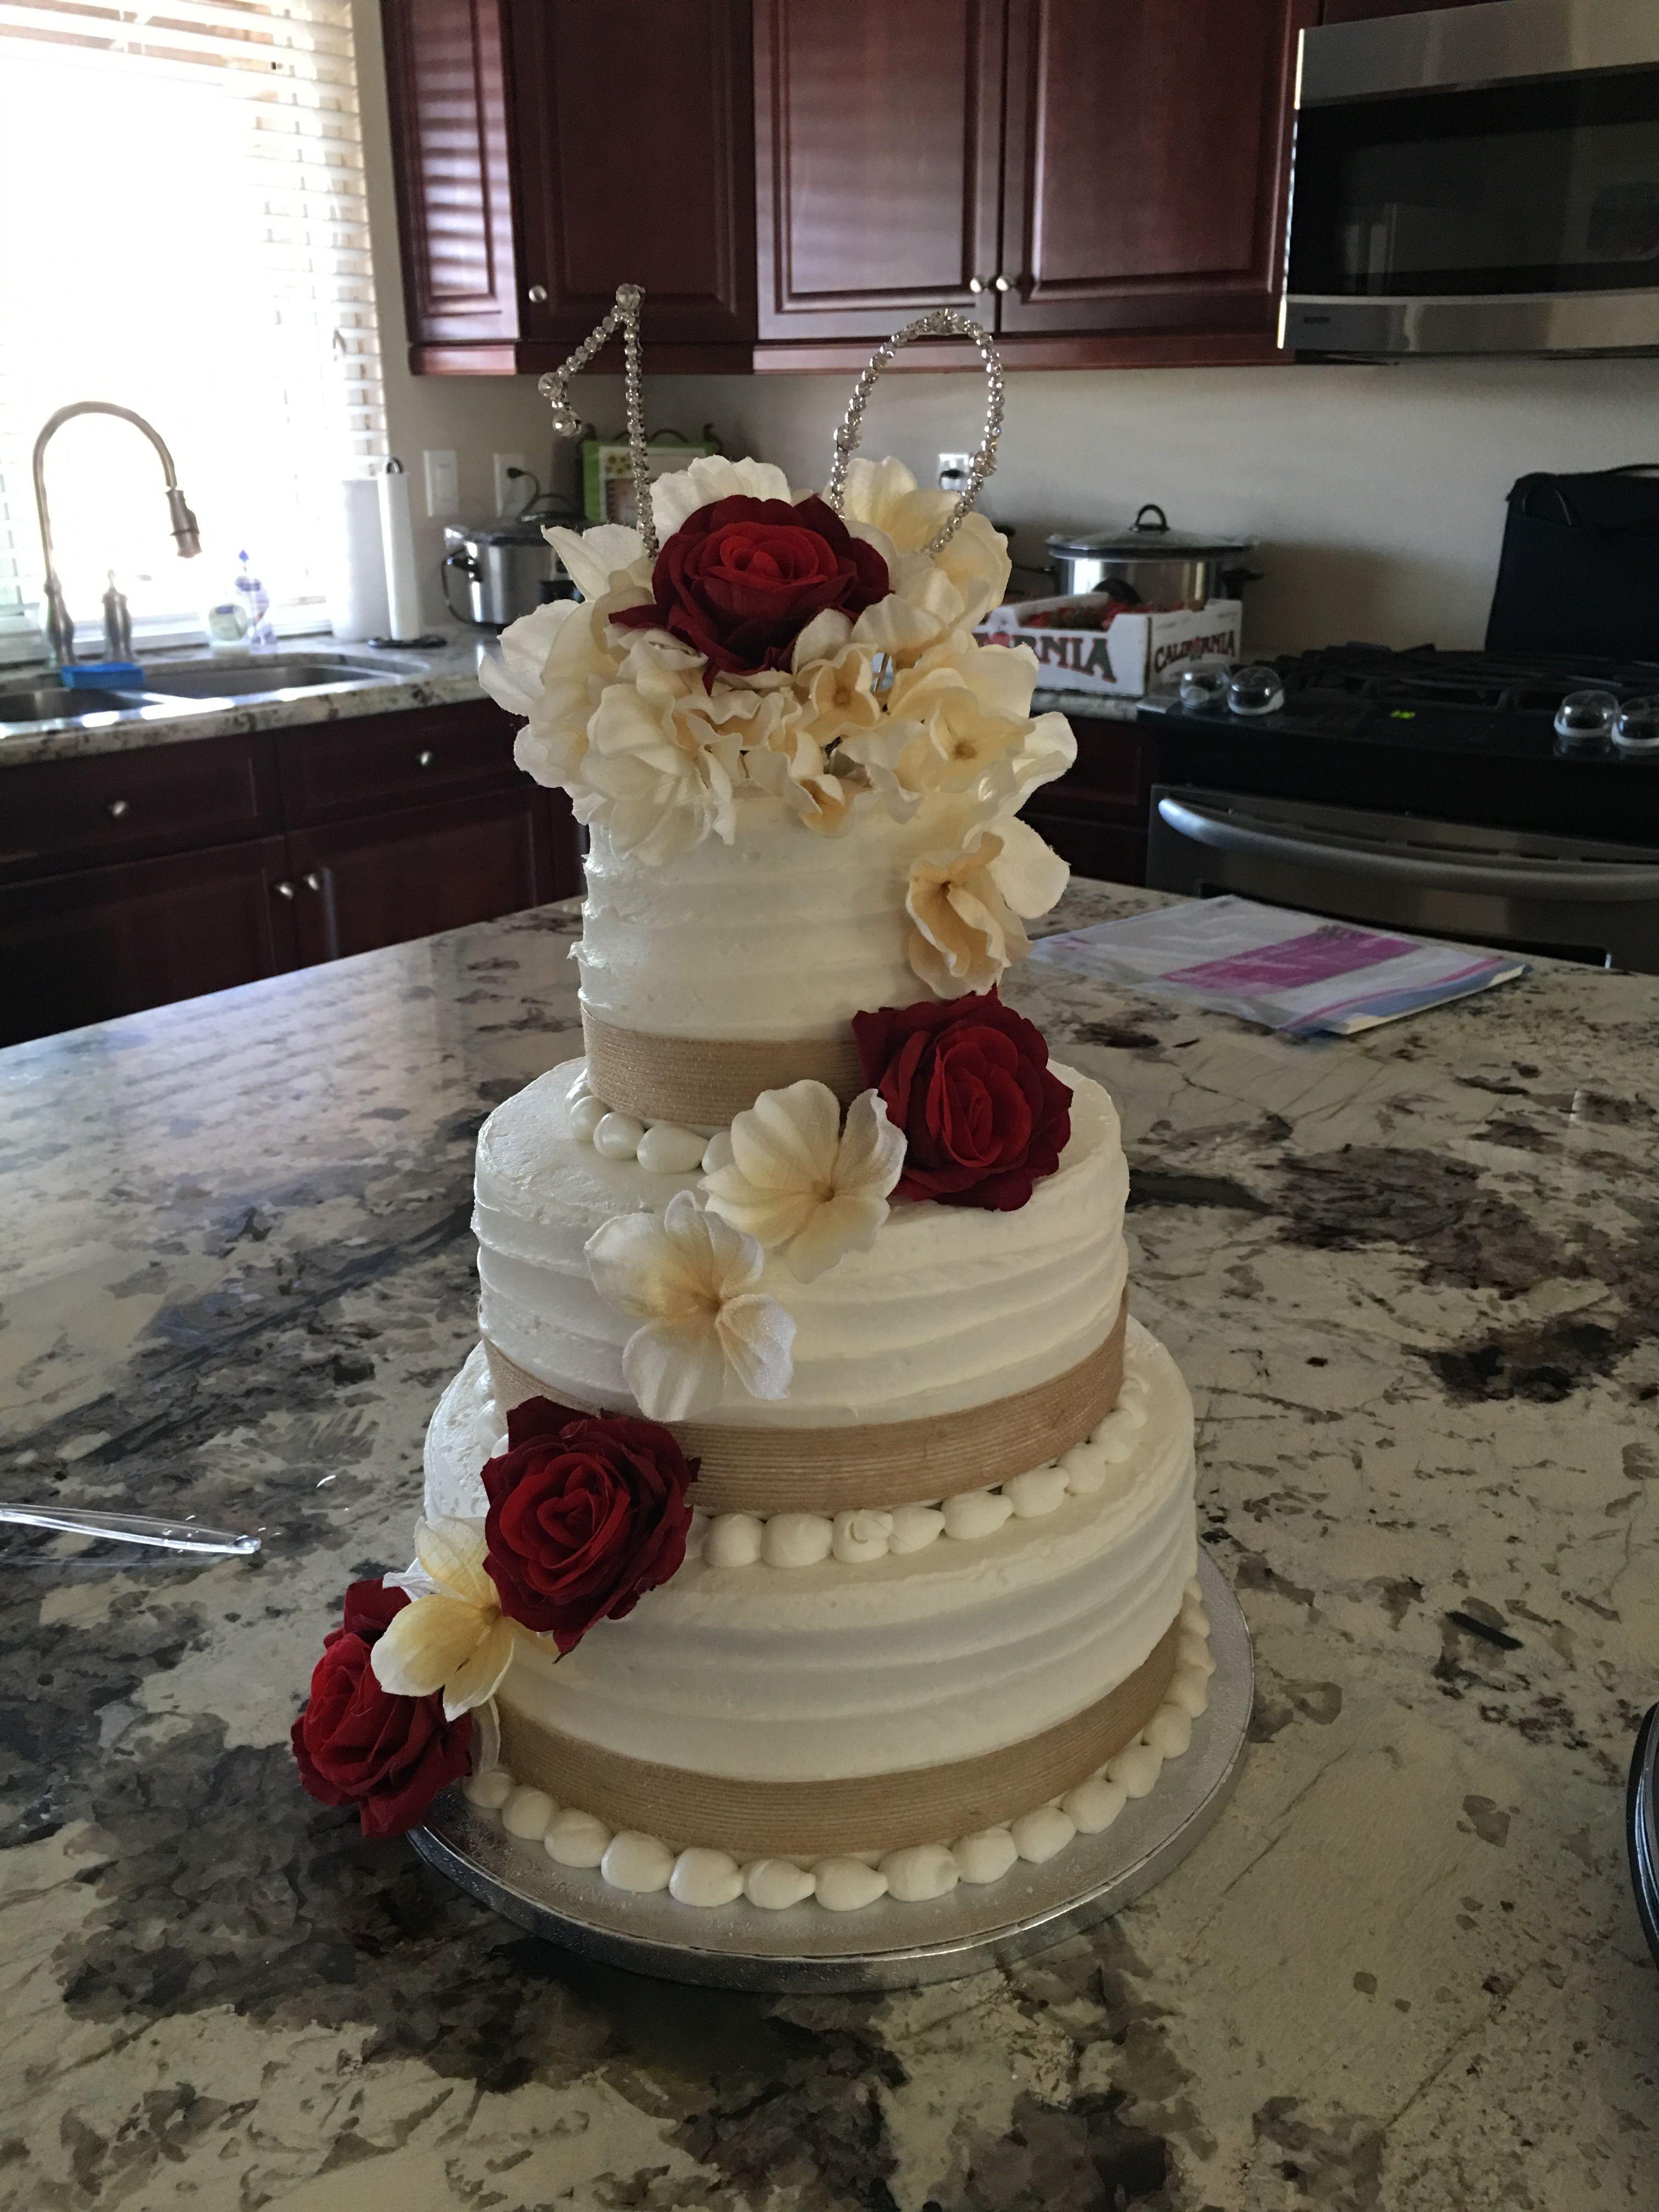 Rustic country wedding cake go buy a three tier cake from samus